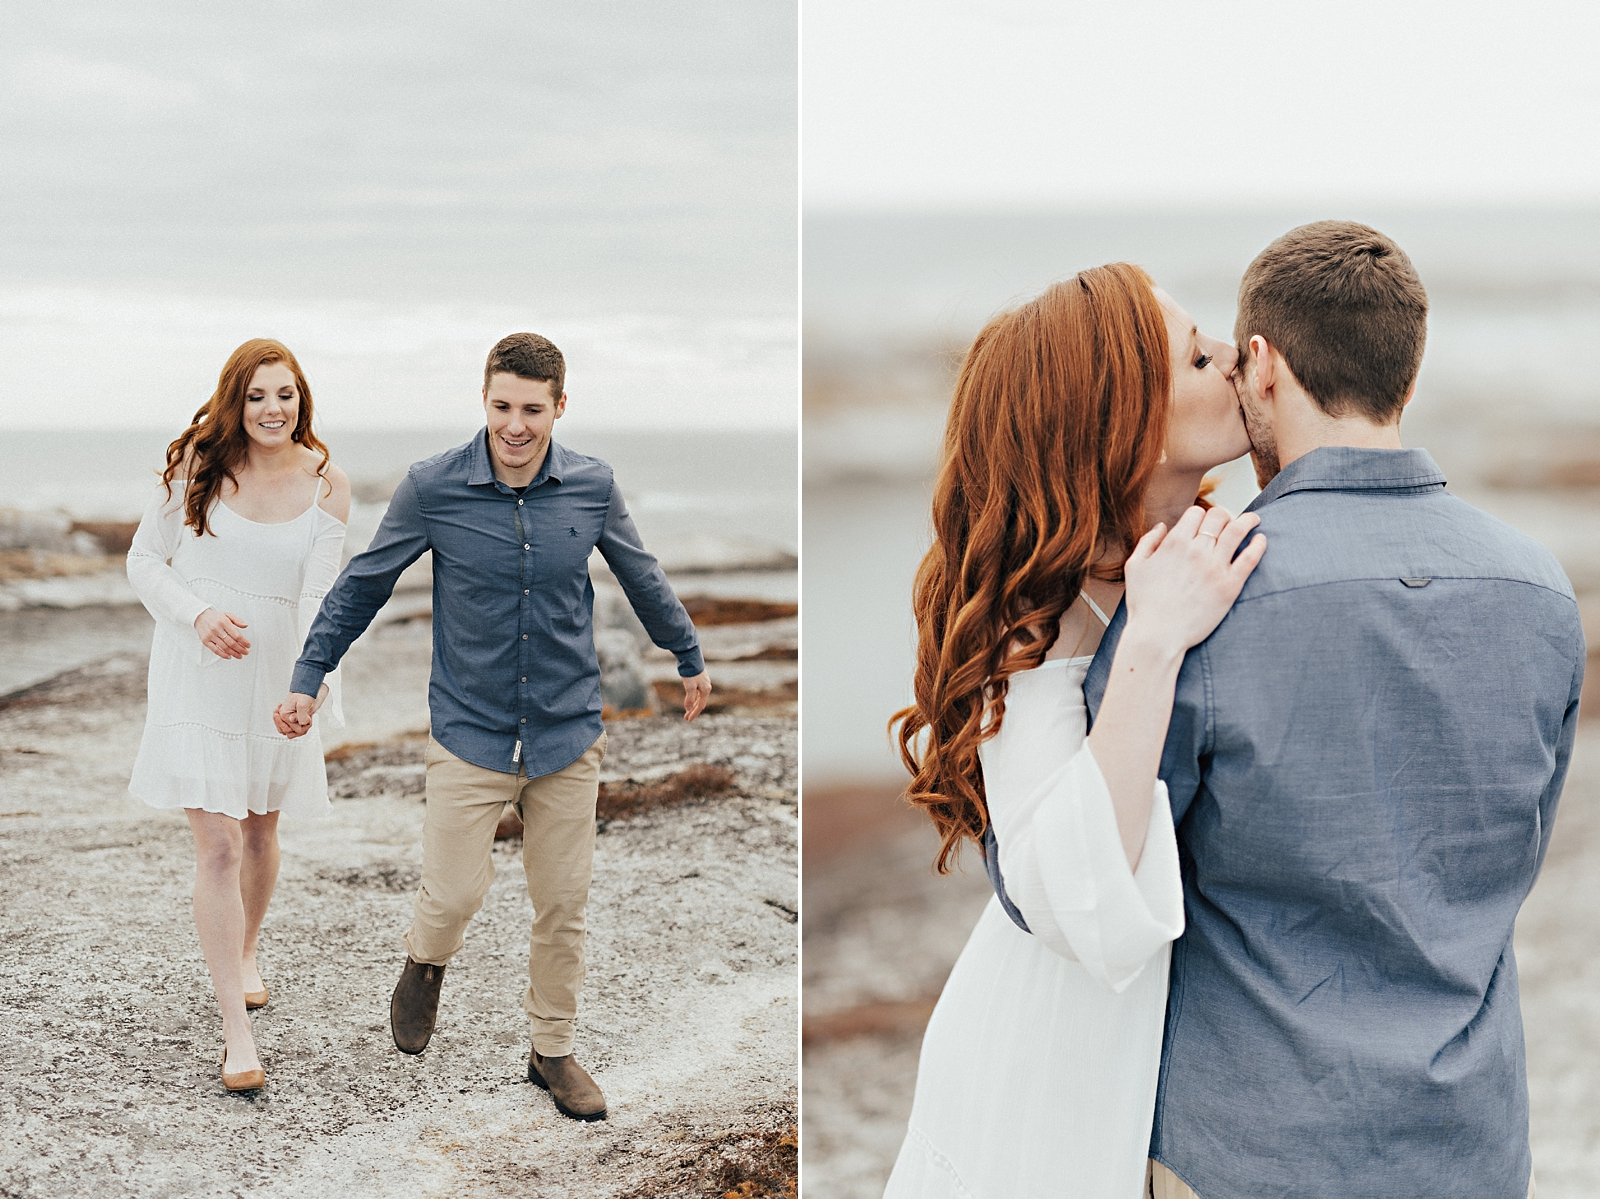 Halifax-Wedding-Photographer_Annie&Ryan_Ocean-Engagement-Shoot_14.jpg